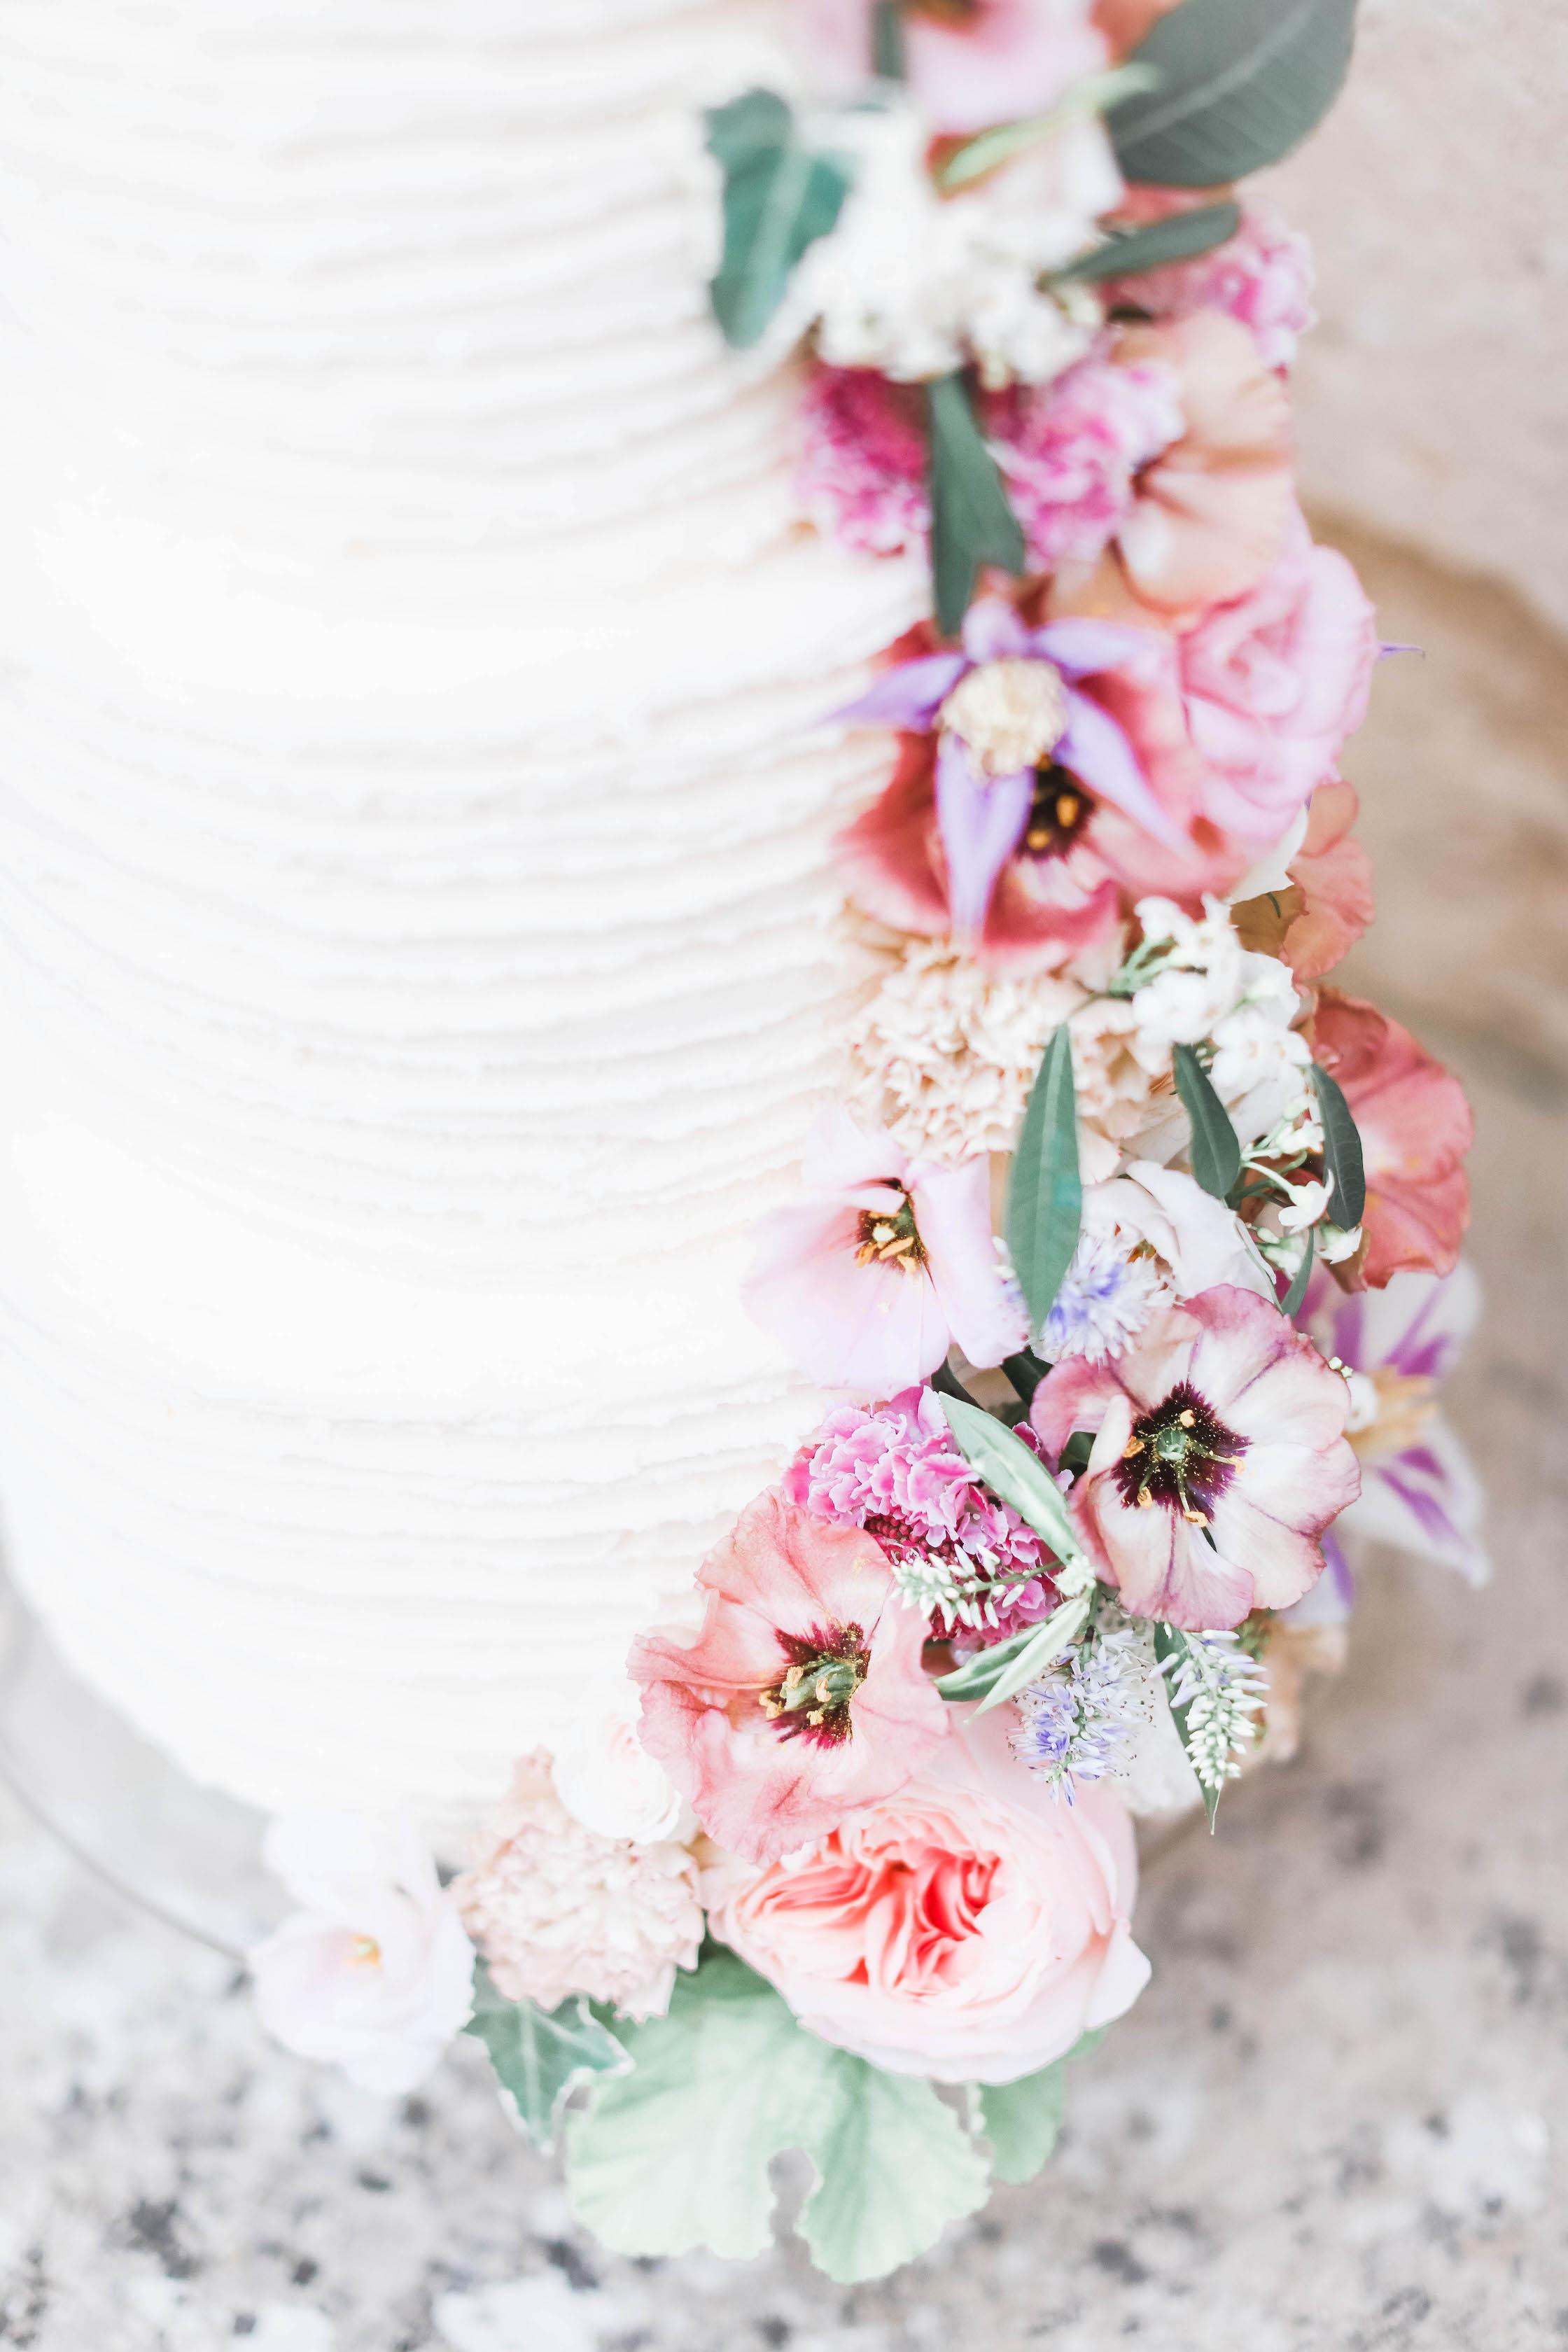 Cake Flowers - Cake Decorations